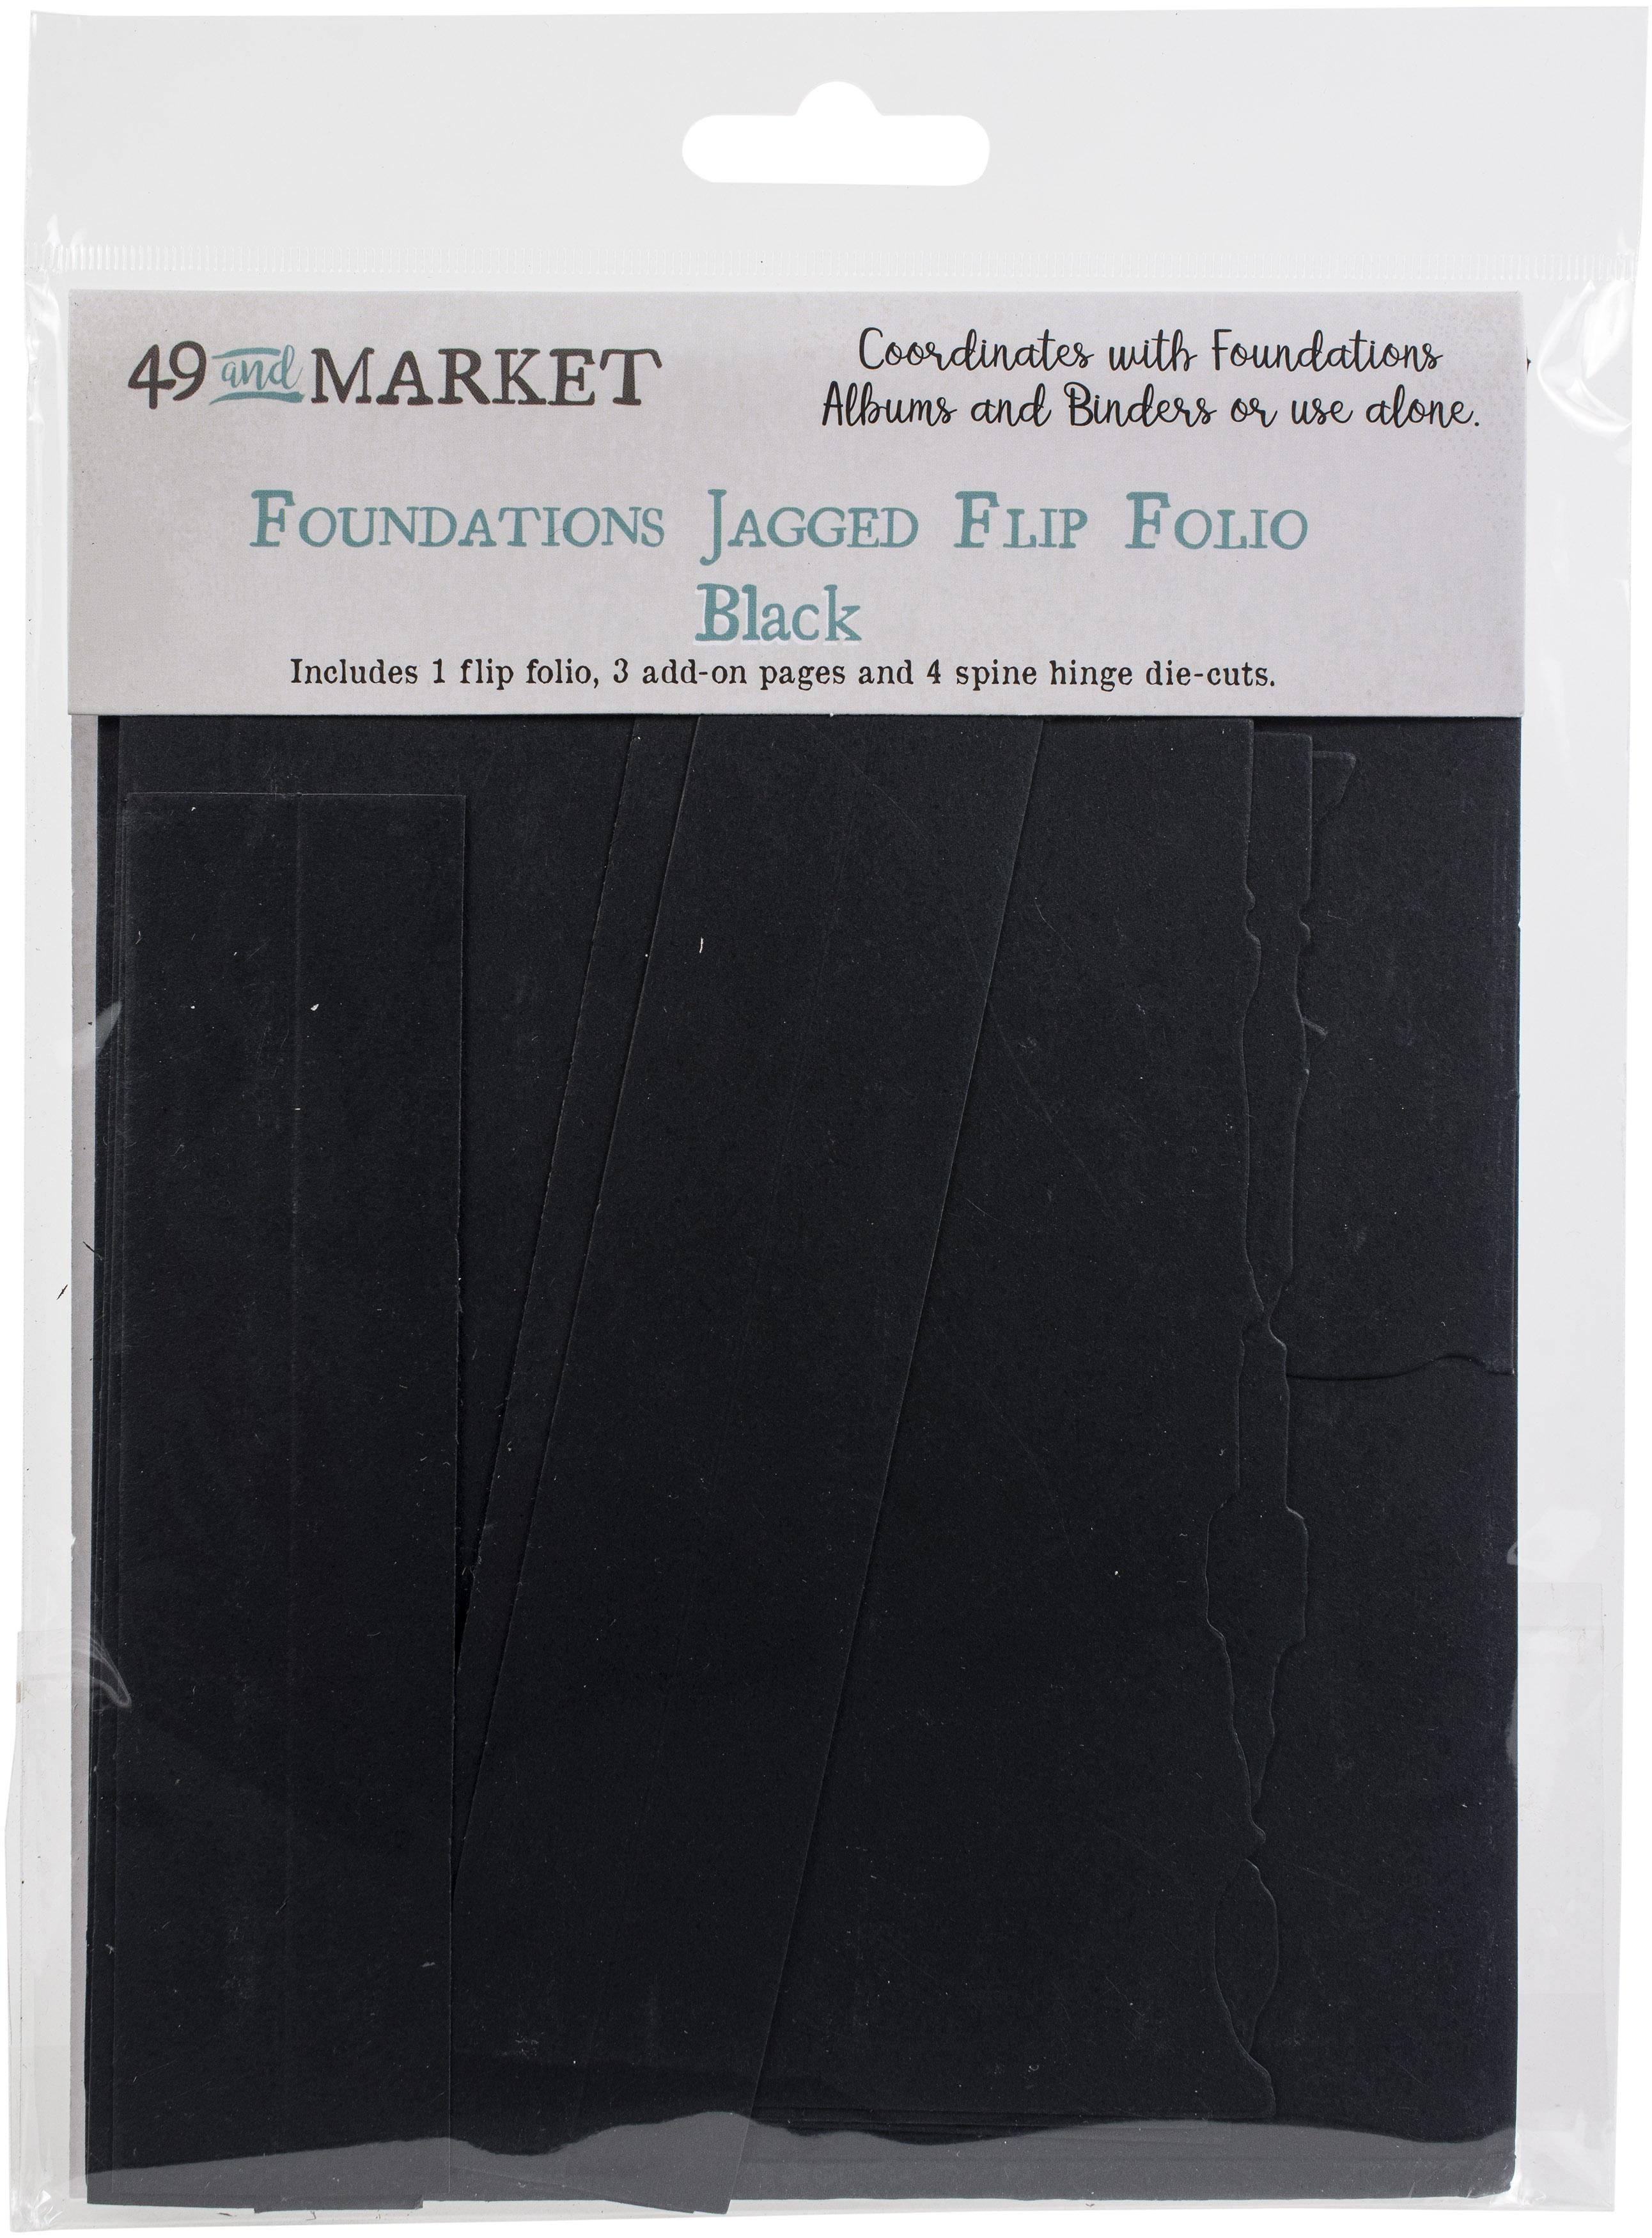 49 And Market Foundations Jagged Flip Folio-Black